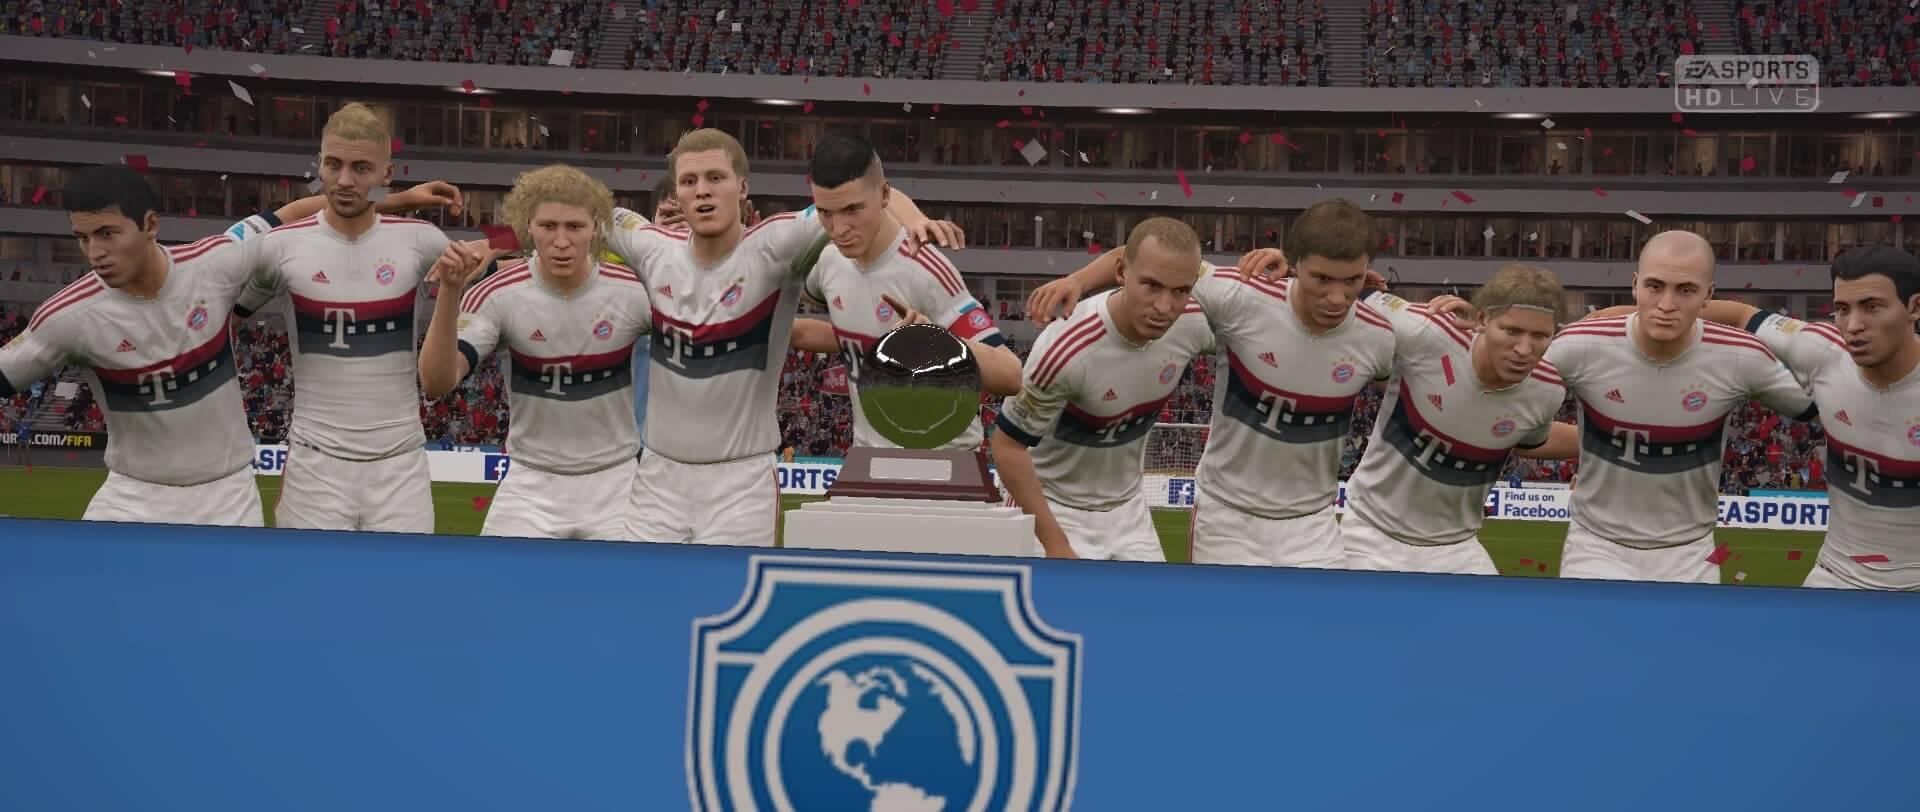 FIFA 16 Pro Clubs Jubel